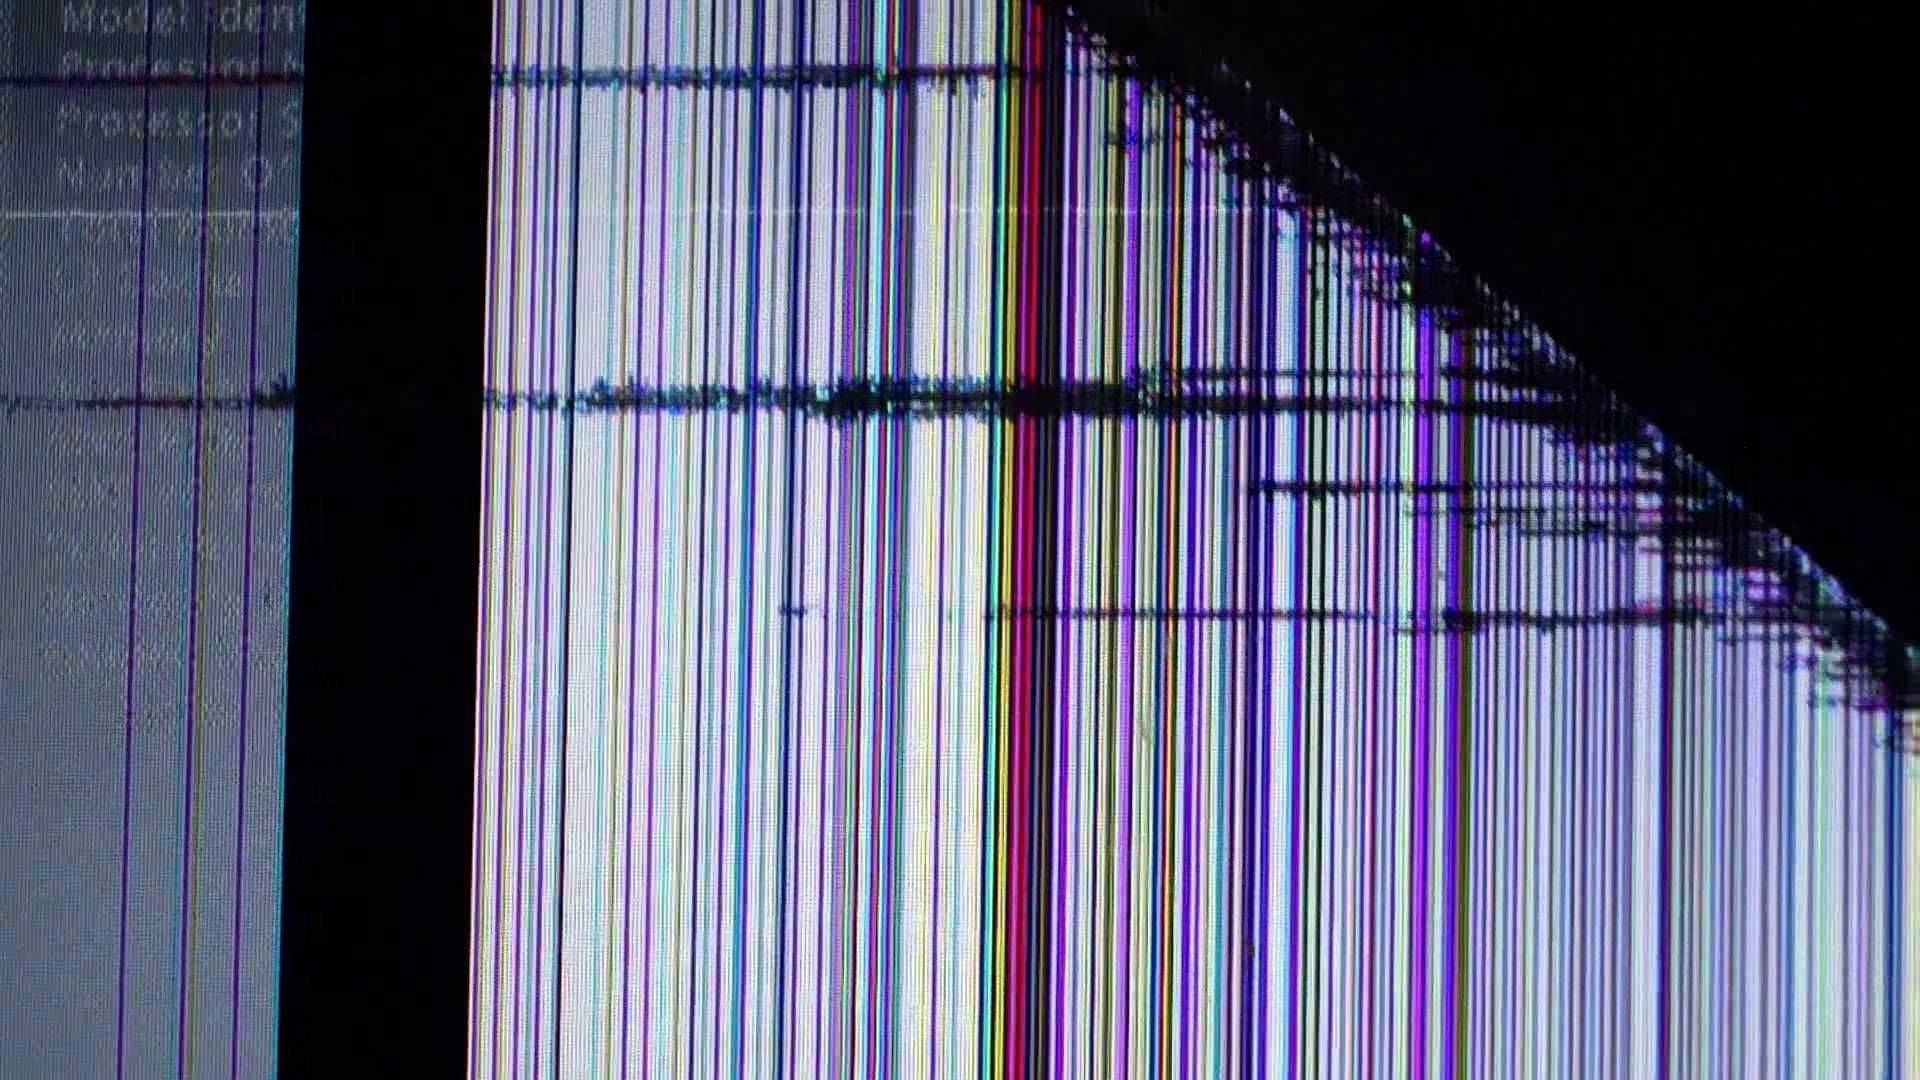 Broken Screen Wallpaper Prank For iPhone iPod Windows and Mac Laptop 1920x1080